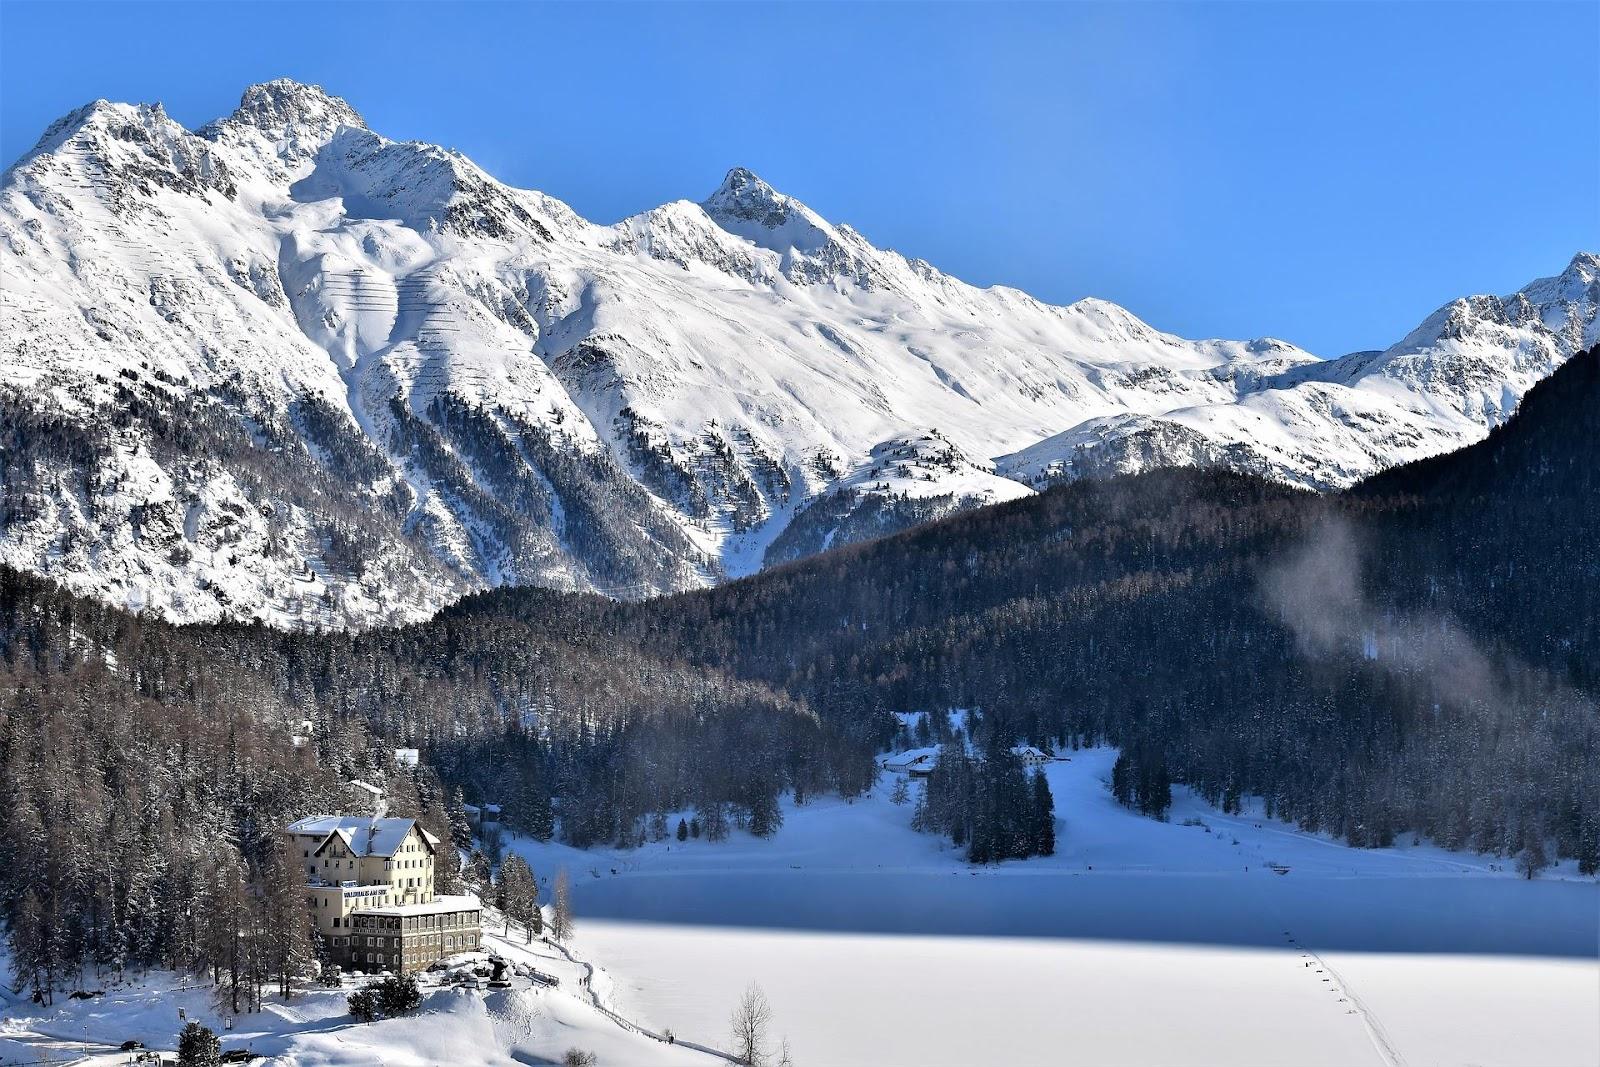 saint moritz ski resort hotel in winter frozen lake alps in background switzerland